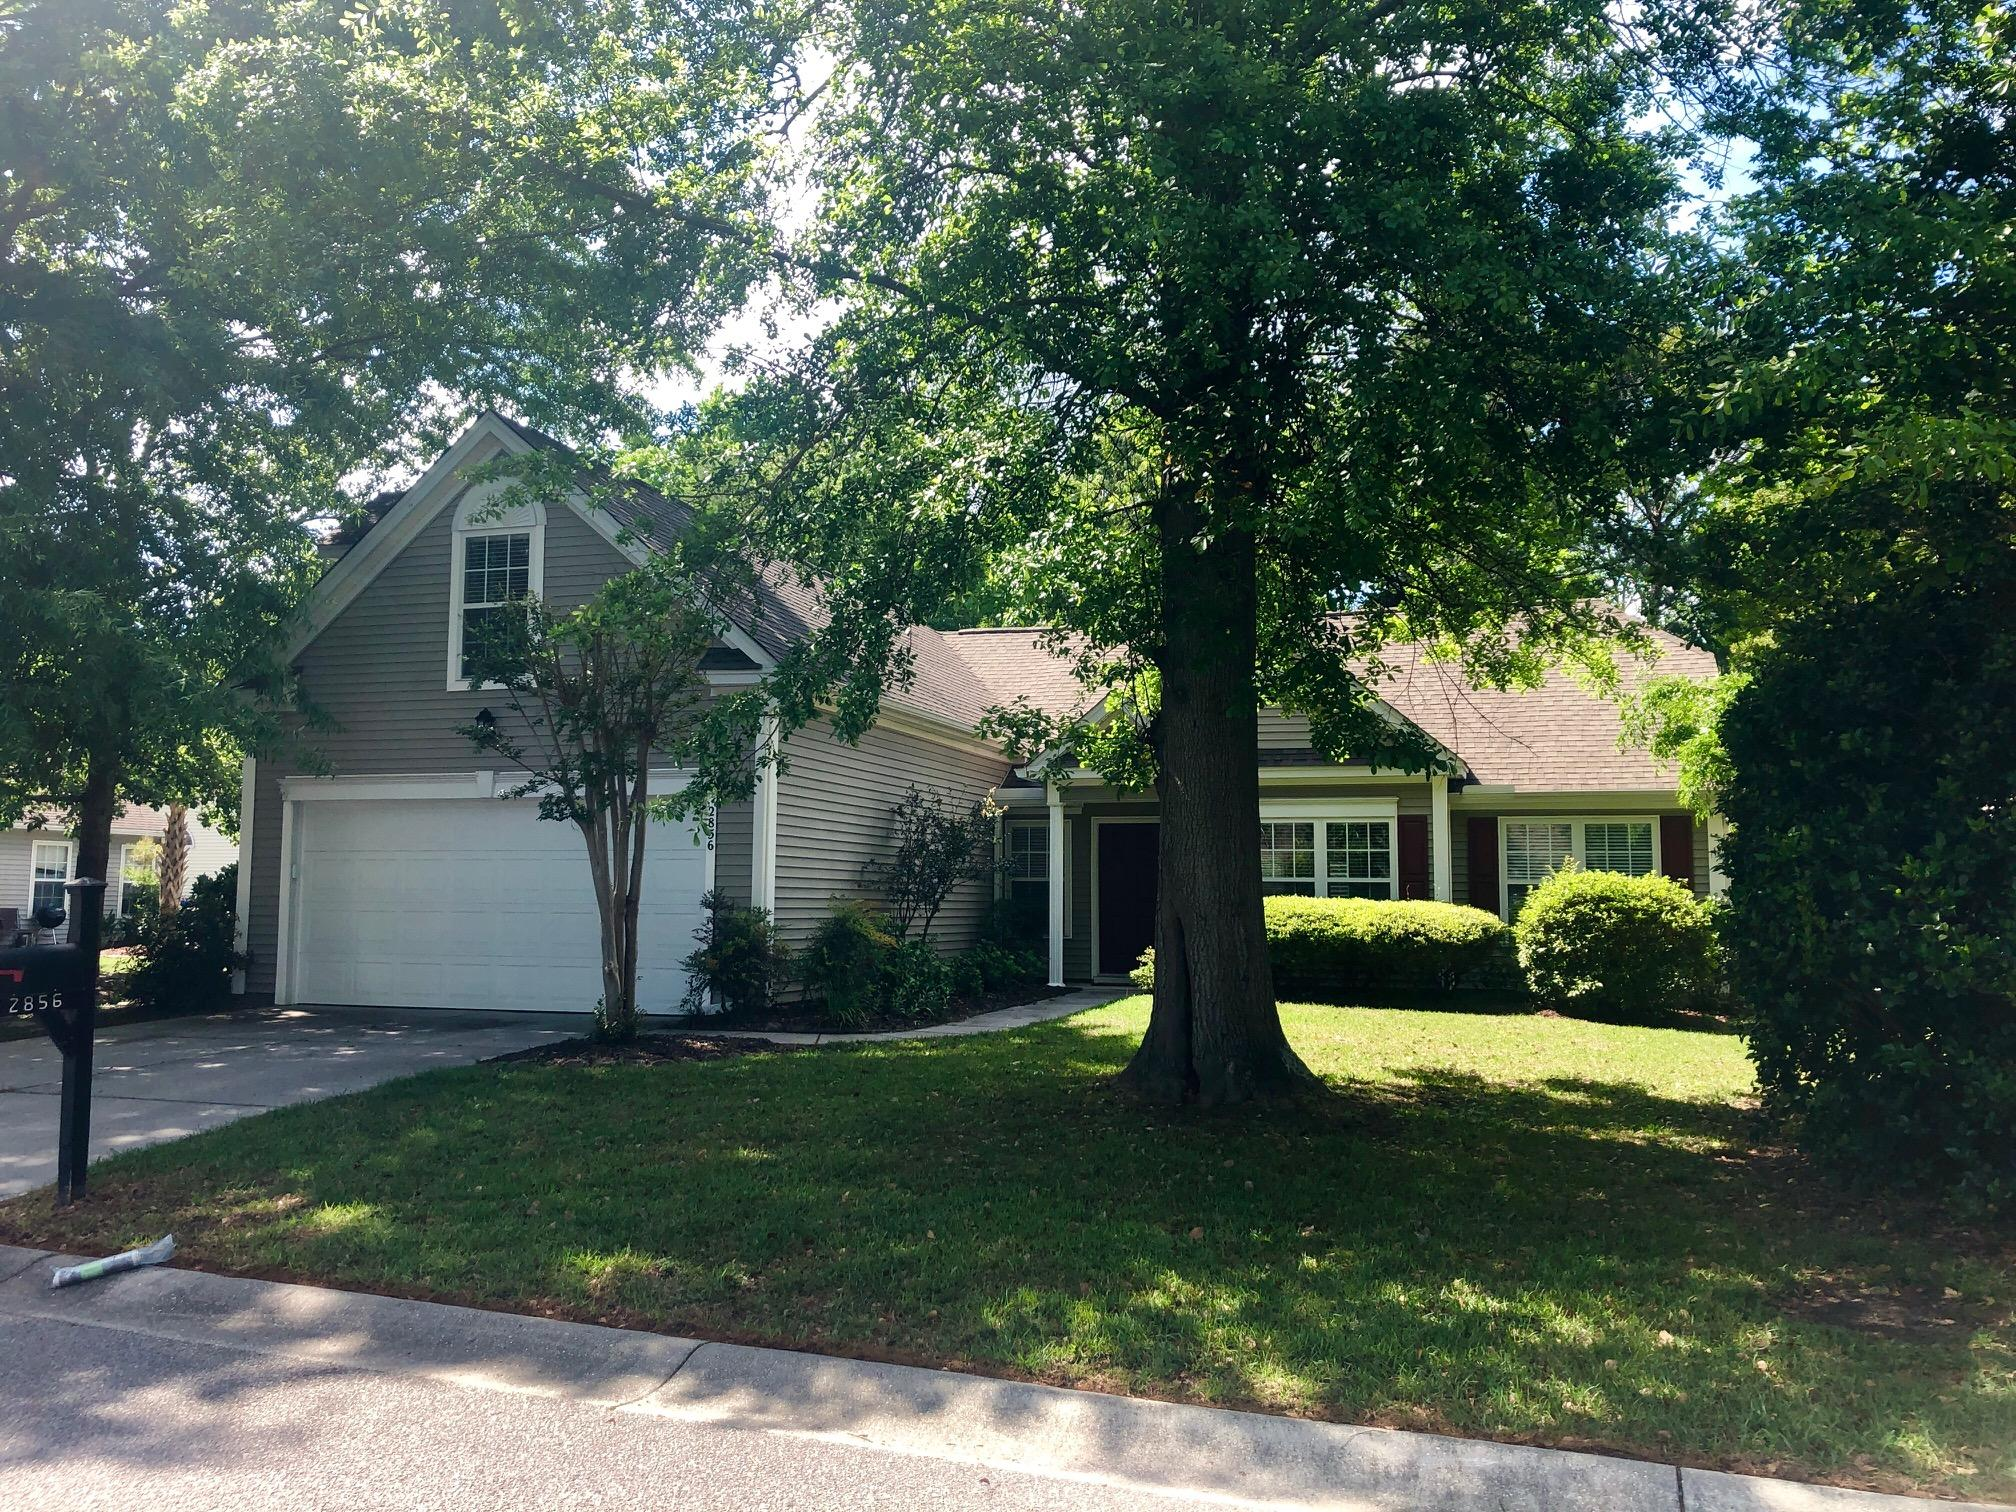 Planters Pointe Homes For Sale - 2856 Curran, Mount Pleasant, SC - 42